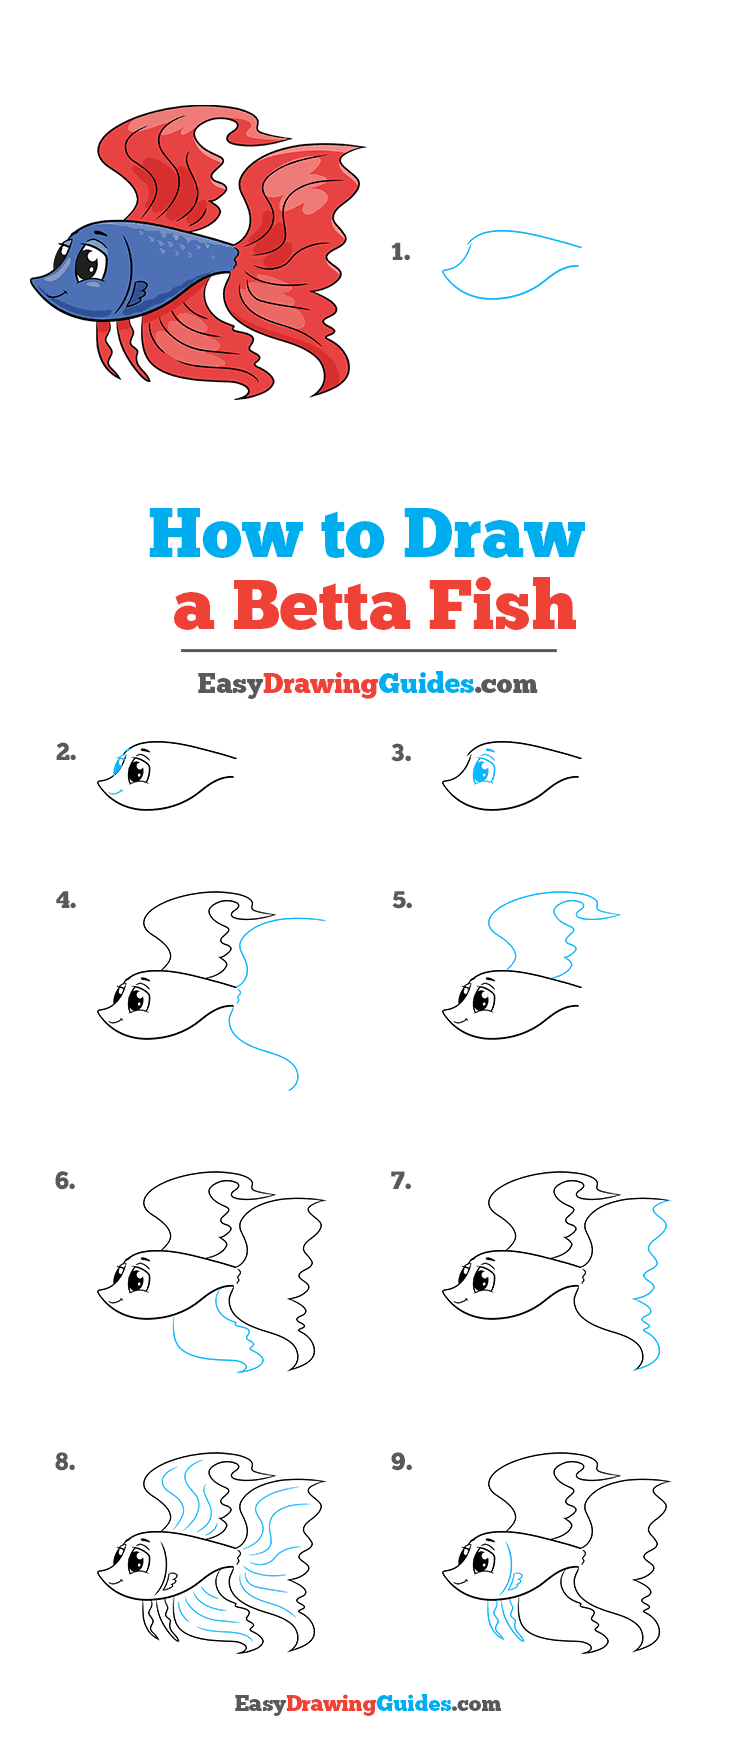 How to Draw Betta Fish